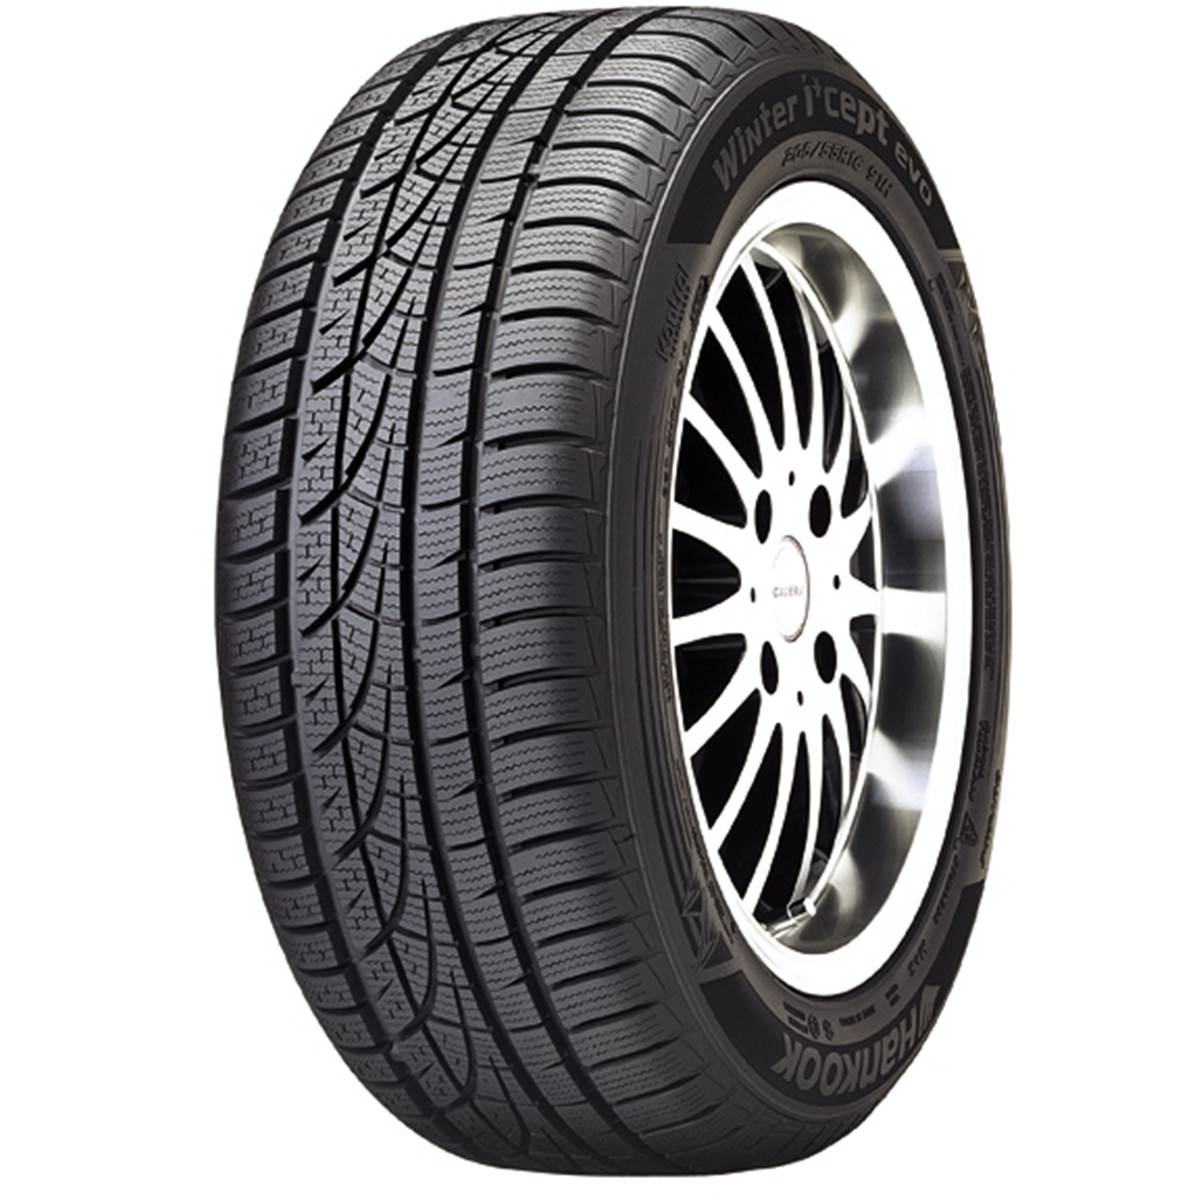 Hankook Winter I-Cept Evo W310 pneu